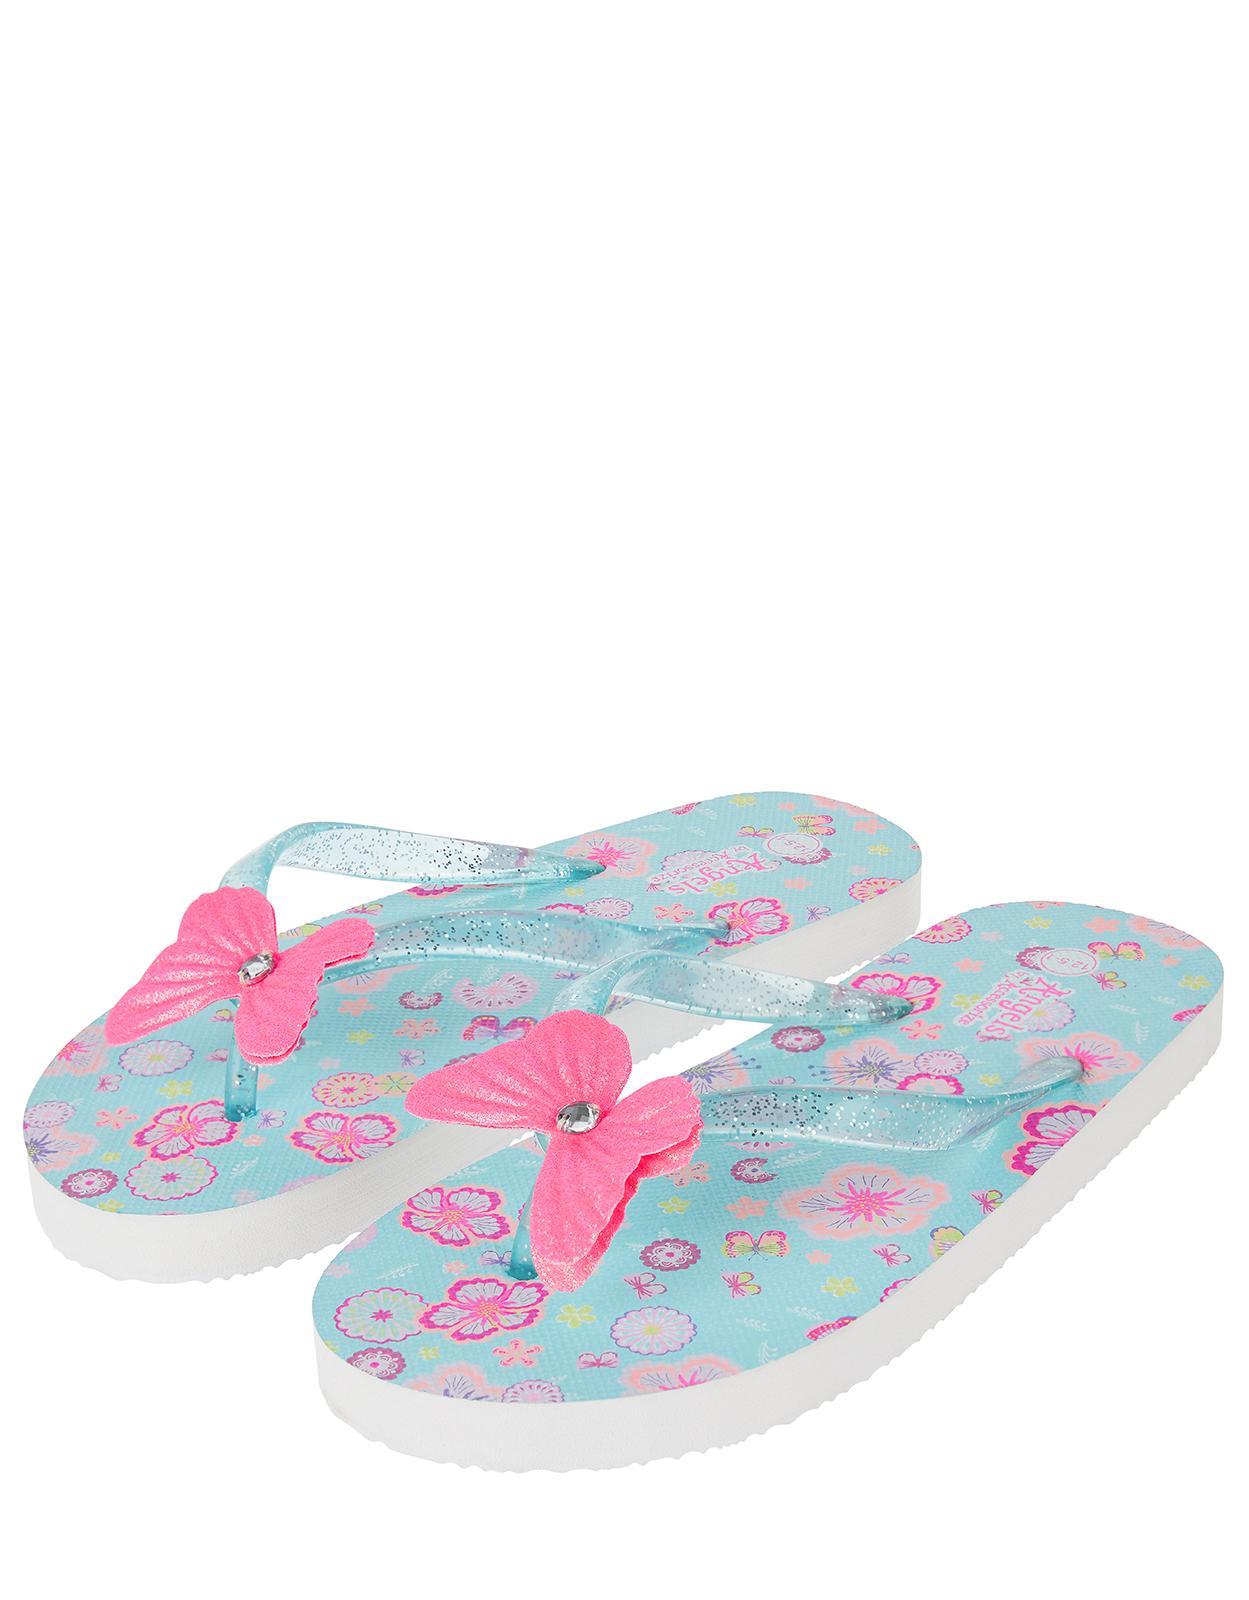 43788d518cb47e Accessorize. Women s Bahama Printed Eva Flip Flops